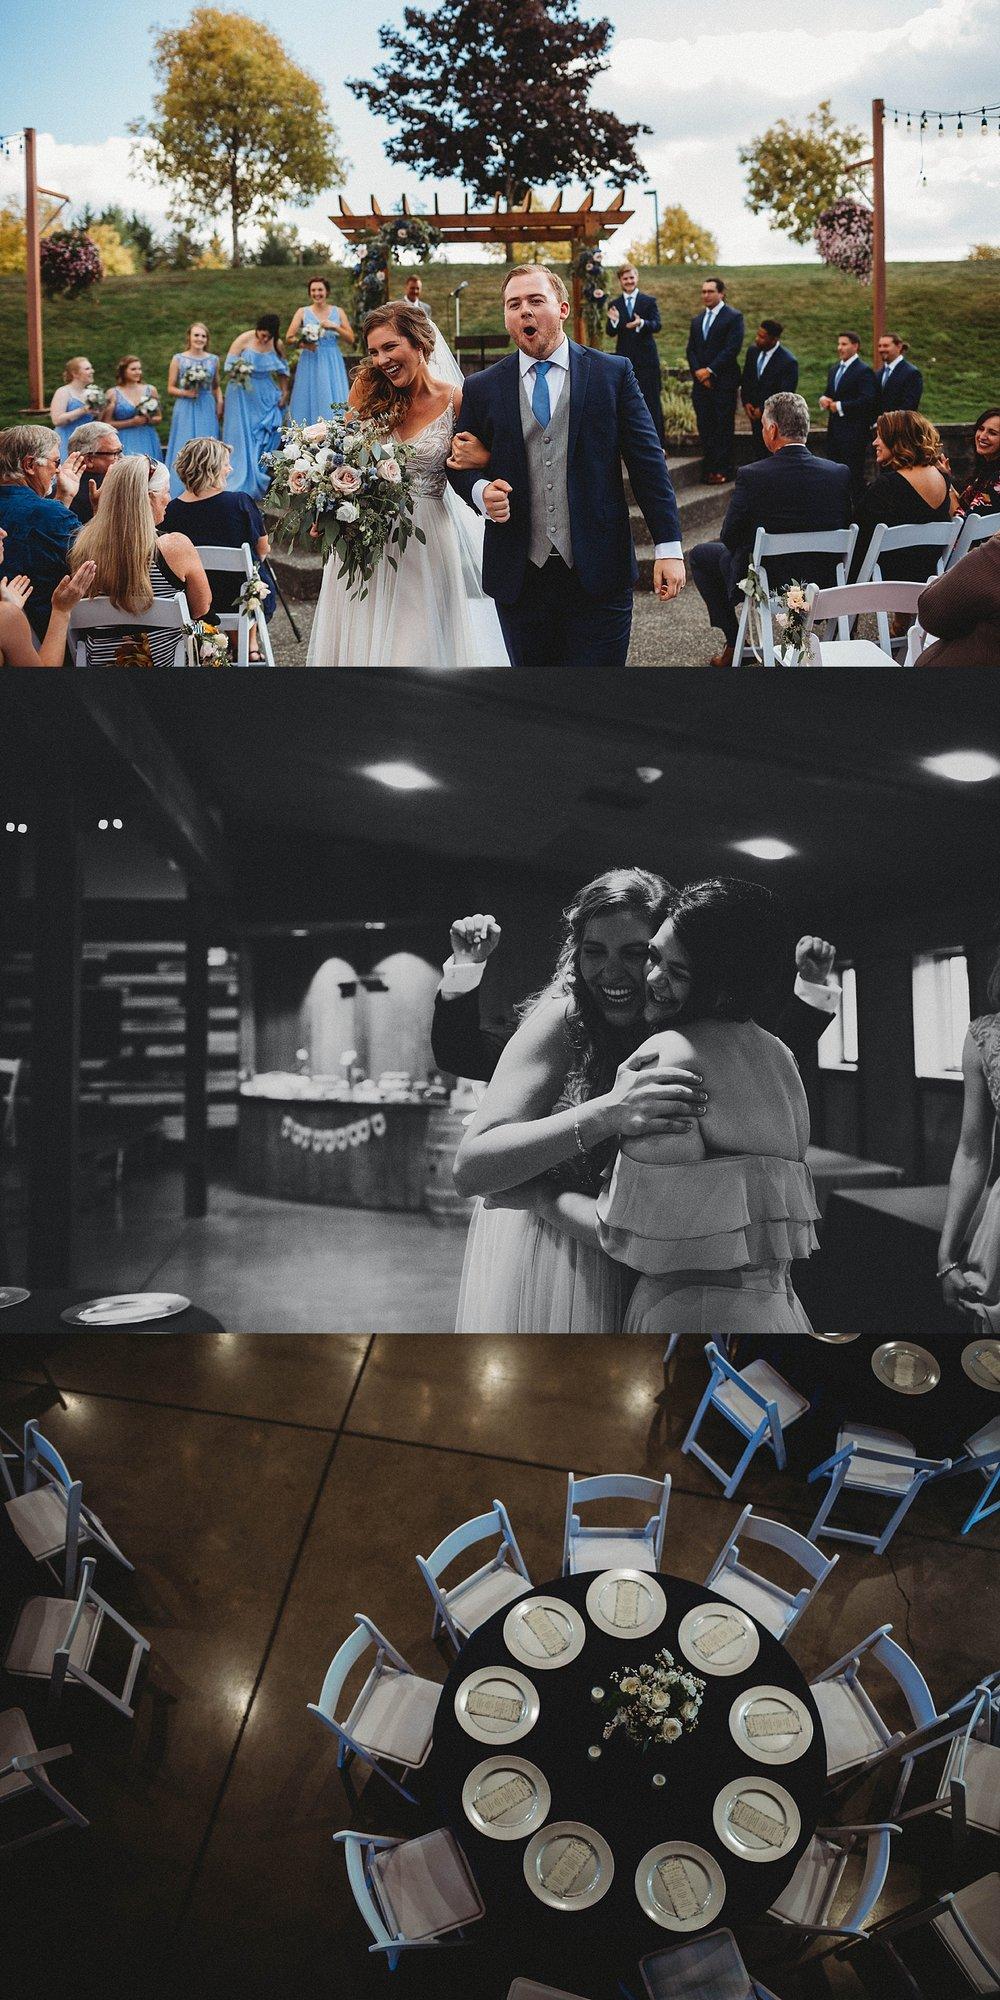 olson mansion wedding photography - jill and garrett - ashley vos photography - seattle area wedding photographer-31.jpg